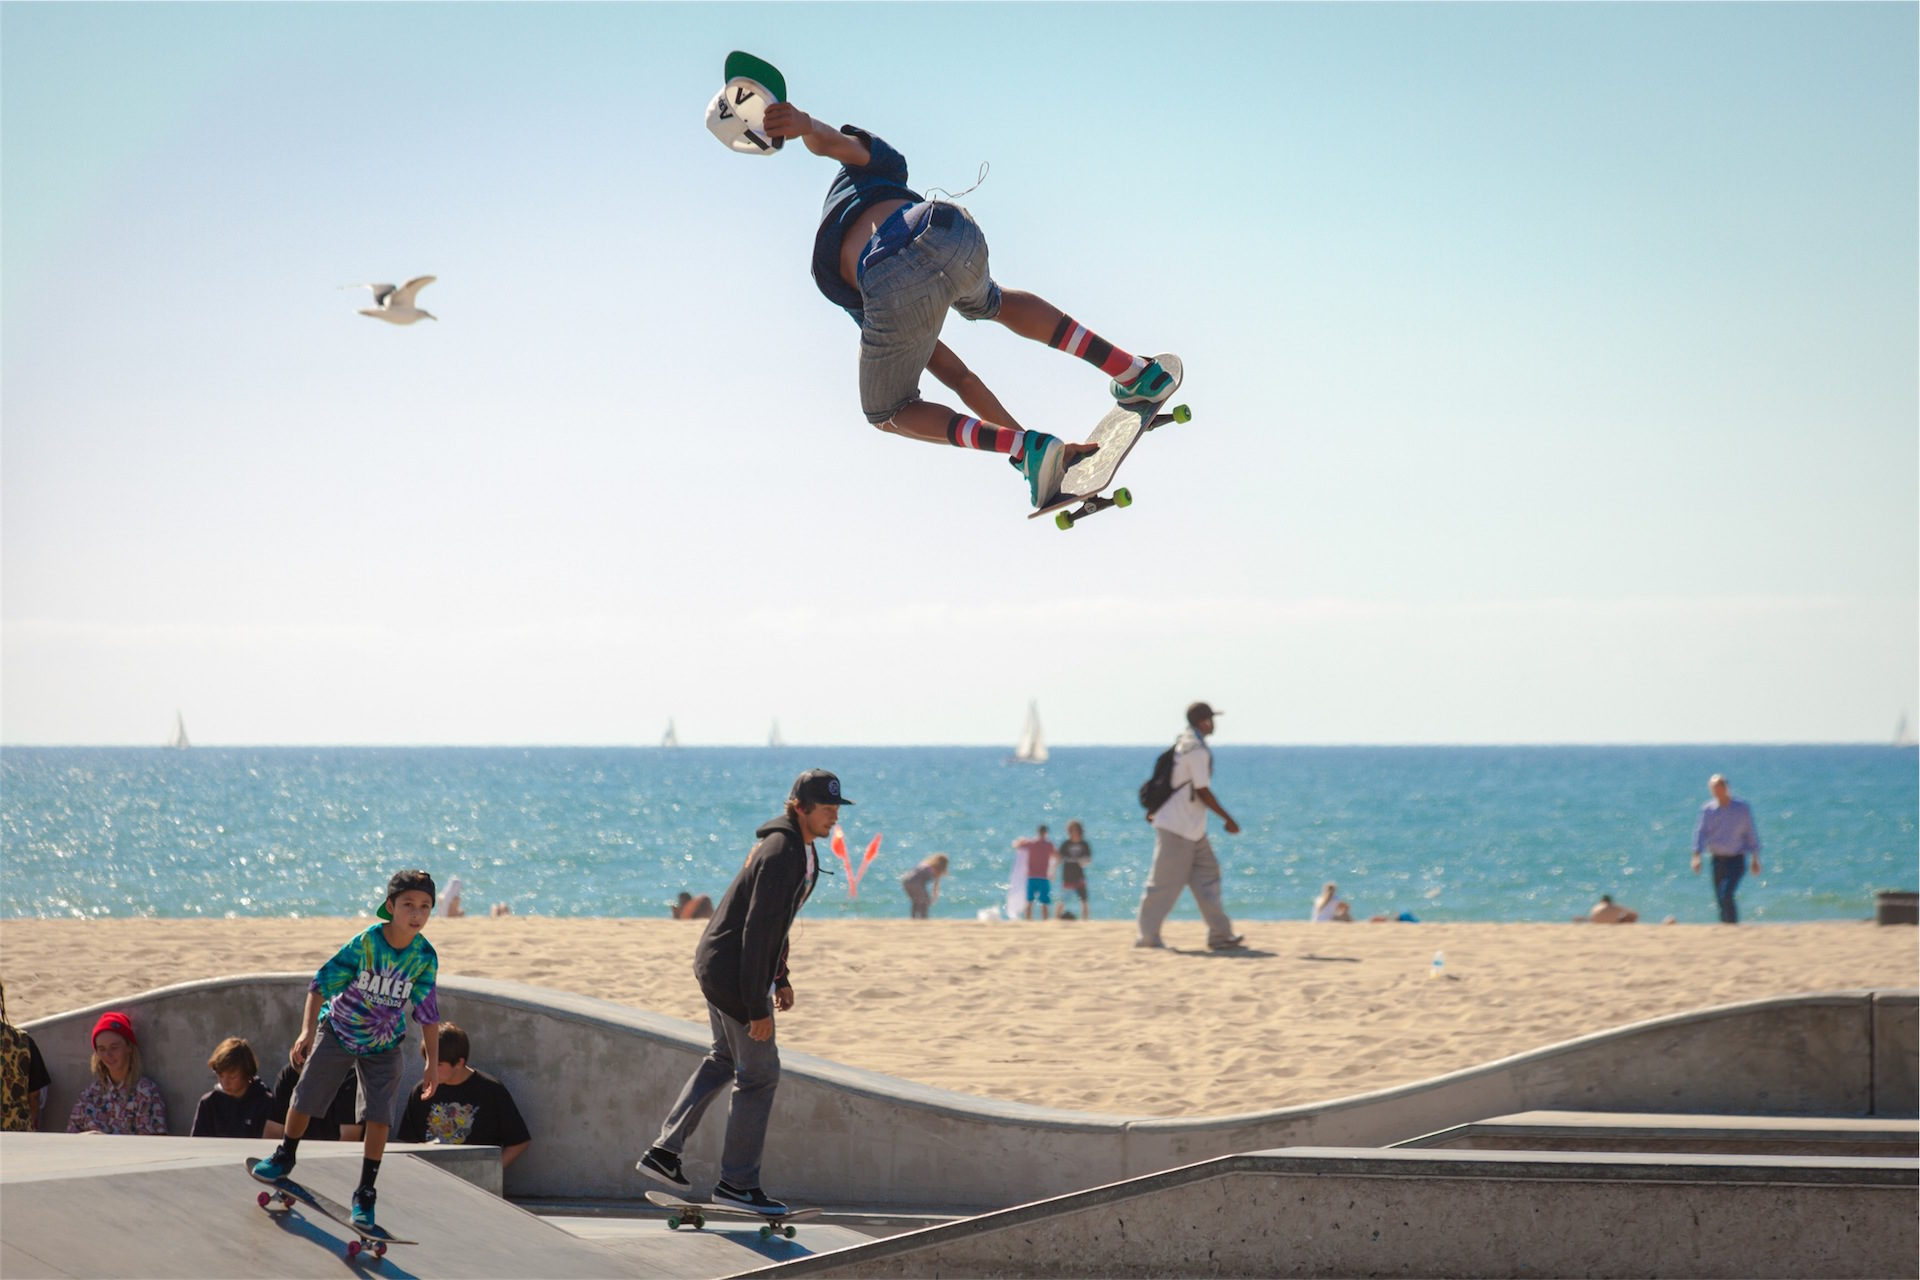 patinar, 滑冰, 海滩, 太阳, diversión - 高清壁纸 - 教授-falken.com